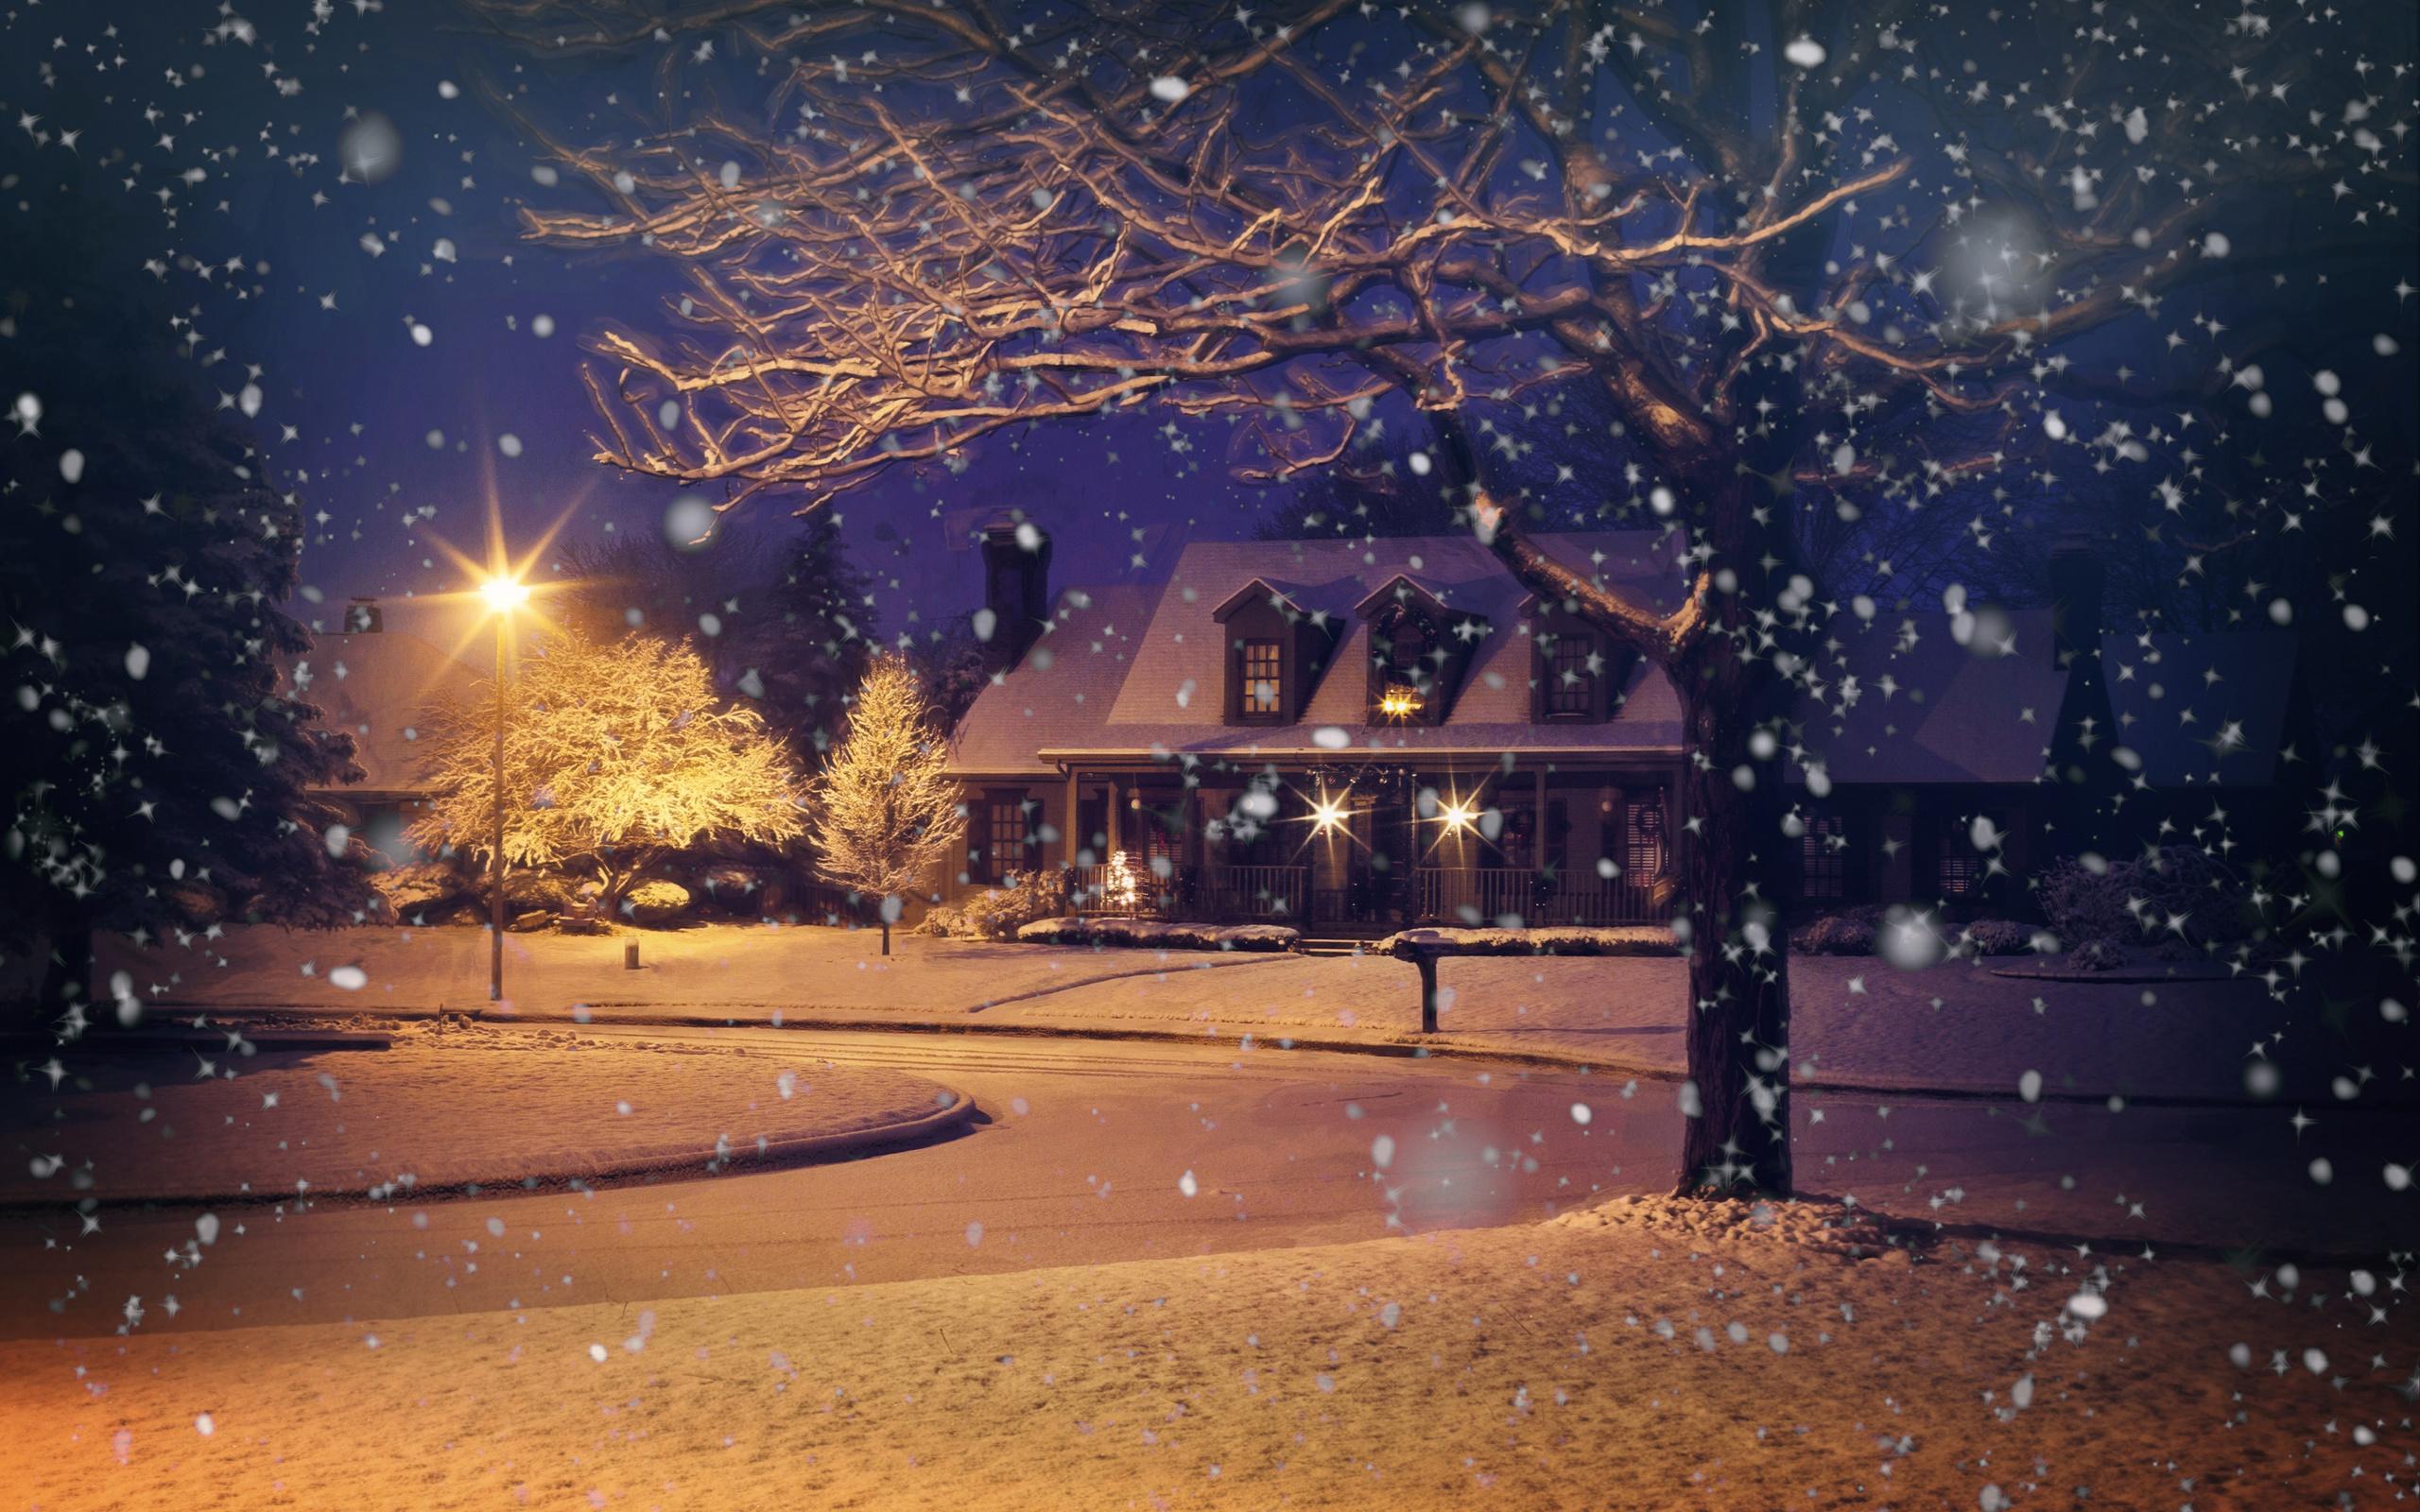 Картинки с снегопадом